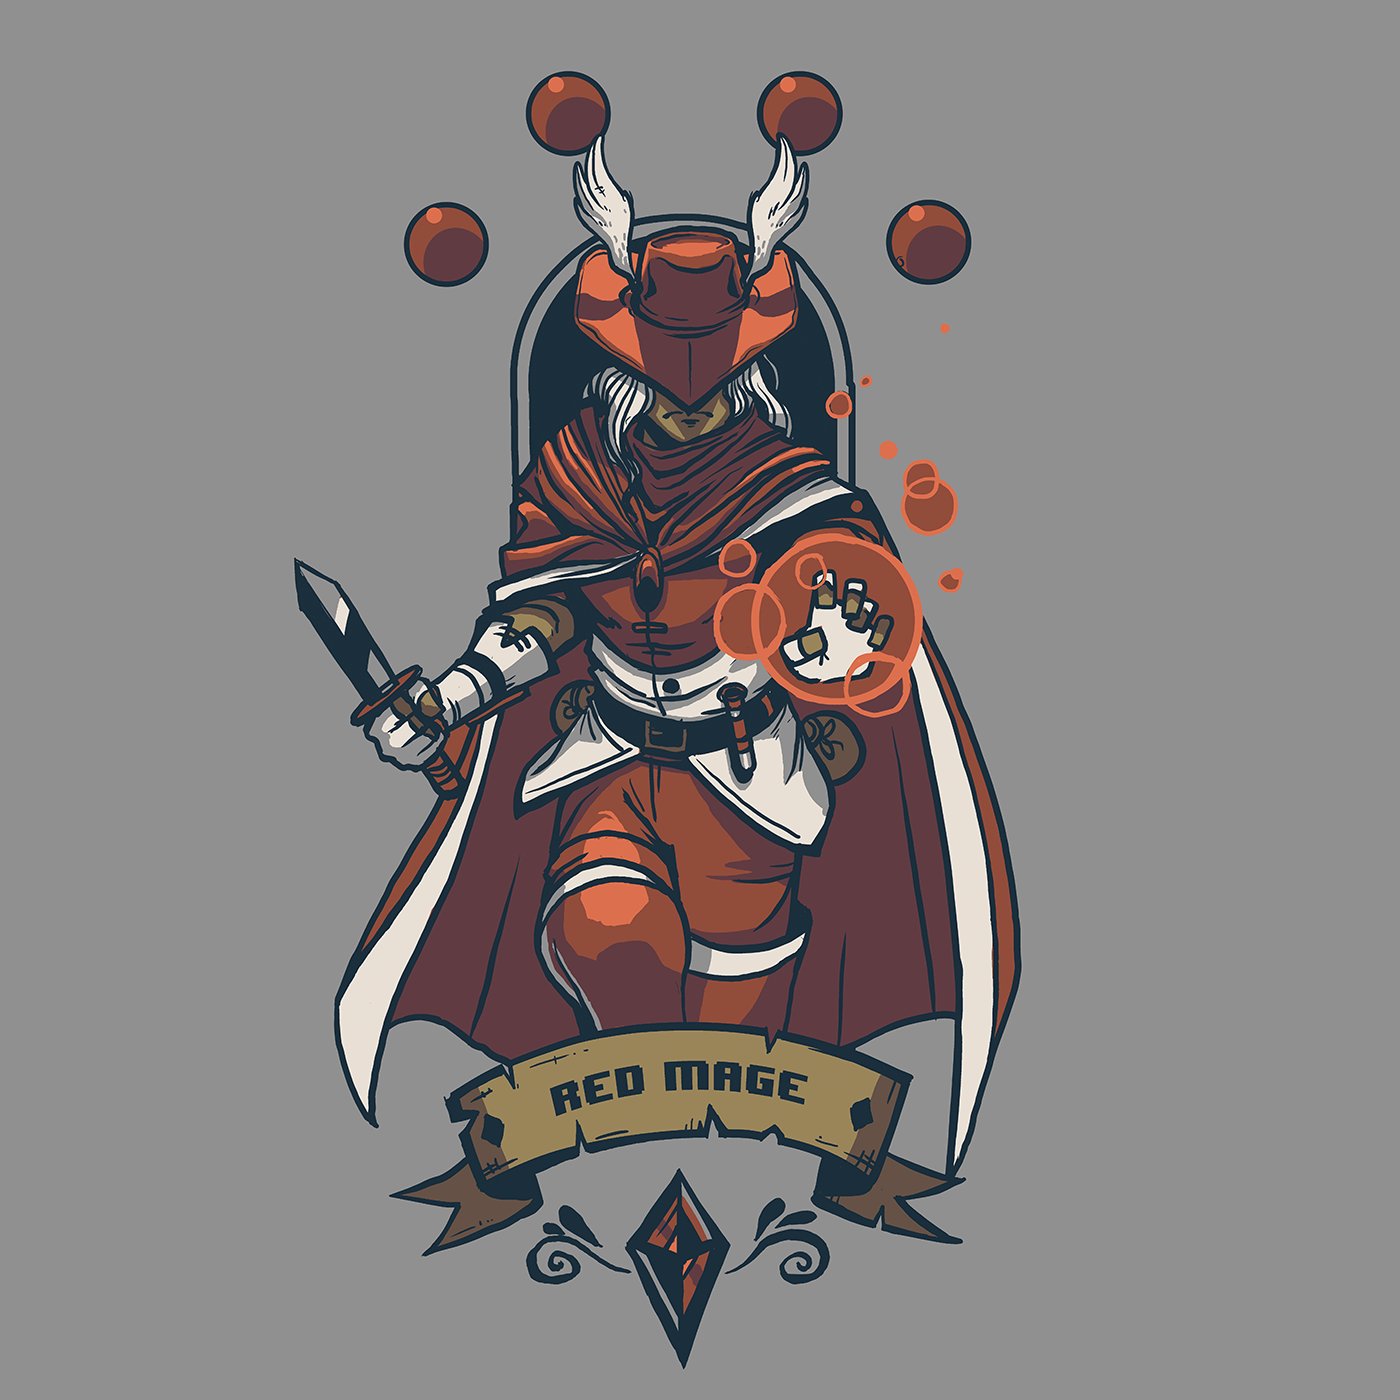 Red Mage Fan Art FFI FinalFantasy Final fantasy